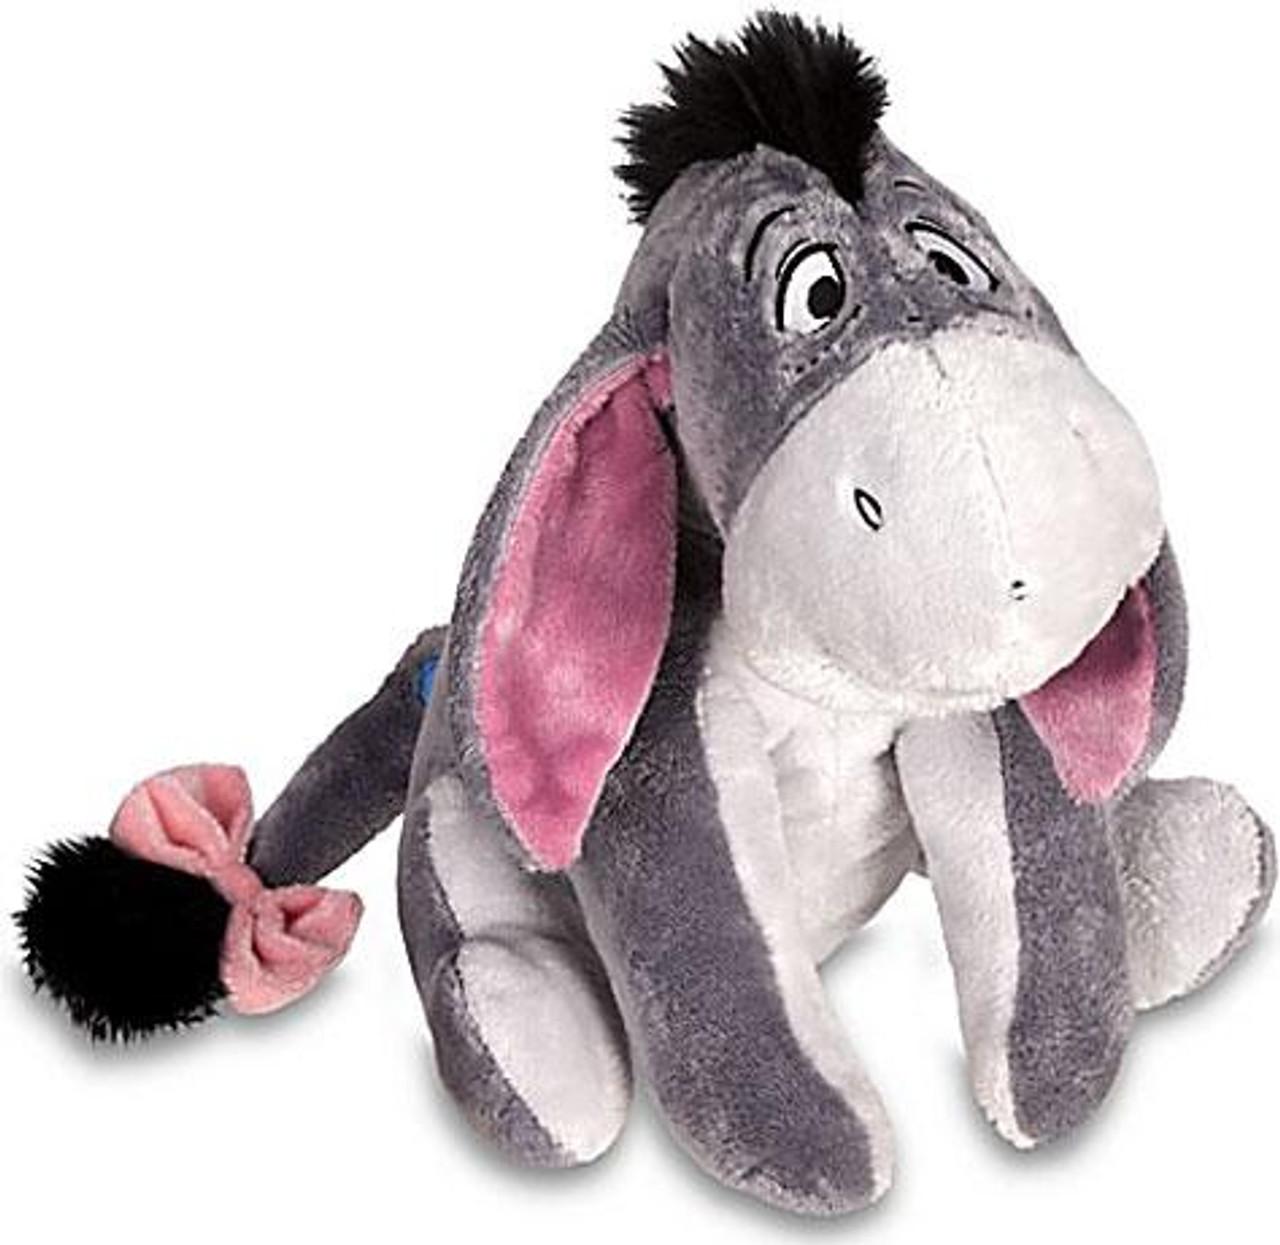 Disney Winnie the Pooh Eeyore Exclusive 11-Inch Plush